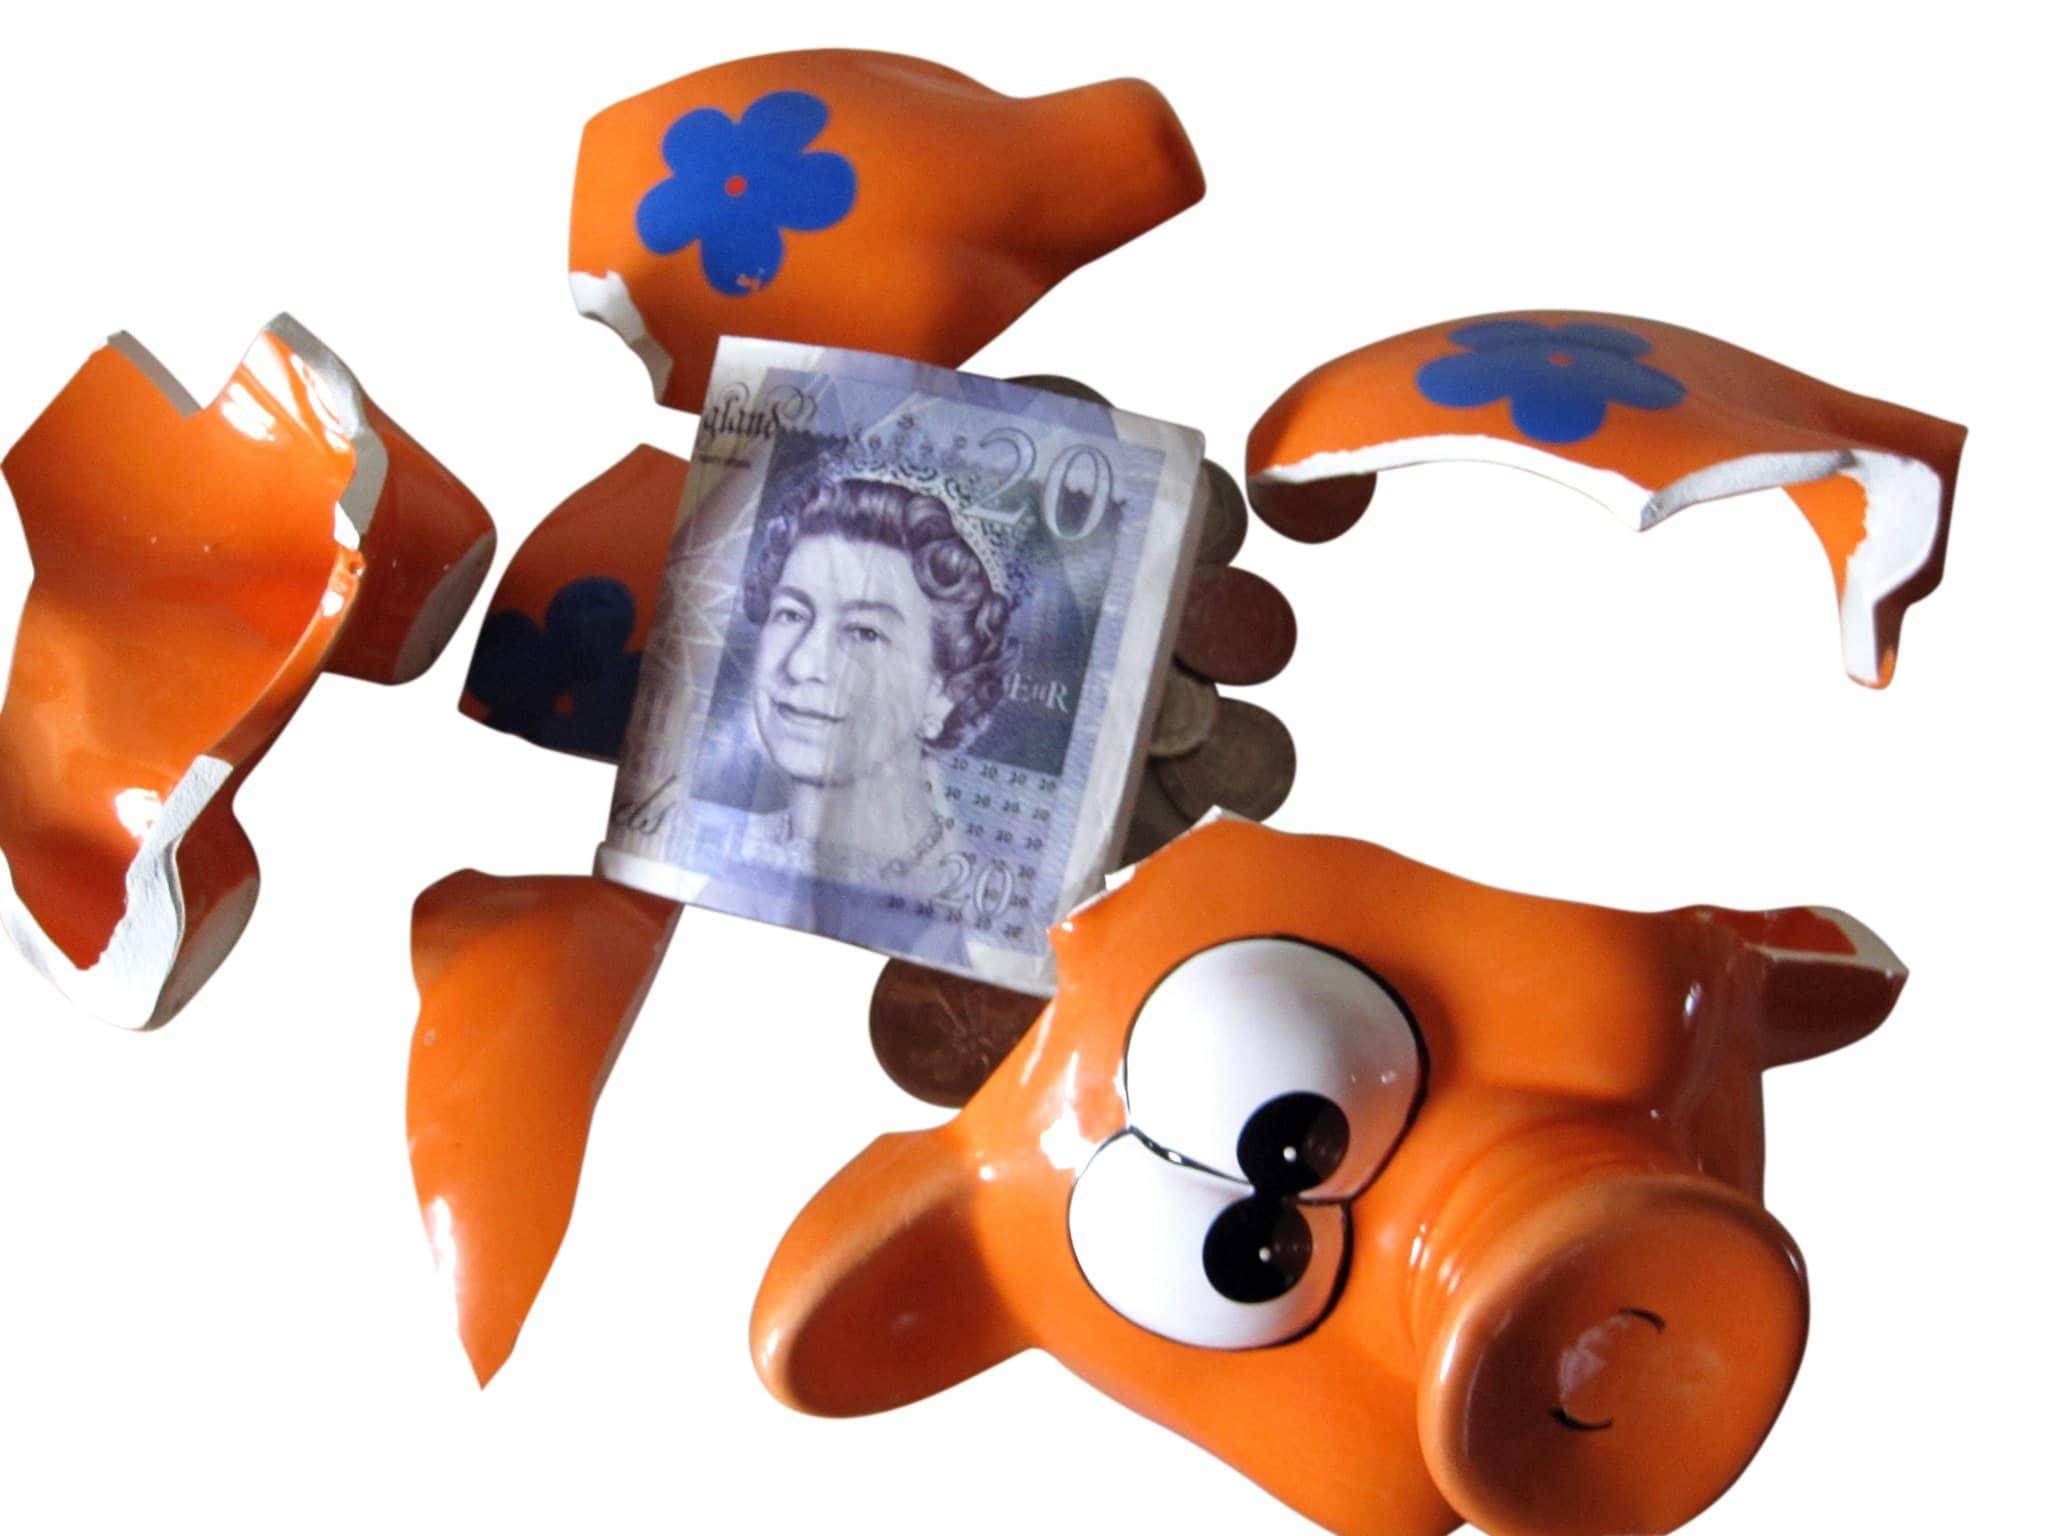 Shared prosperity fund